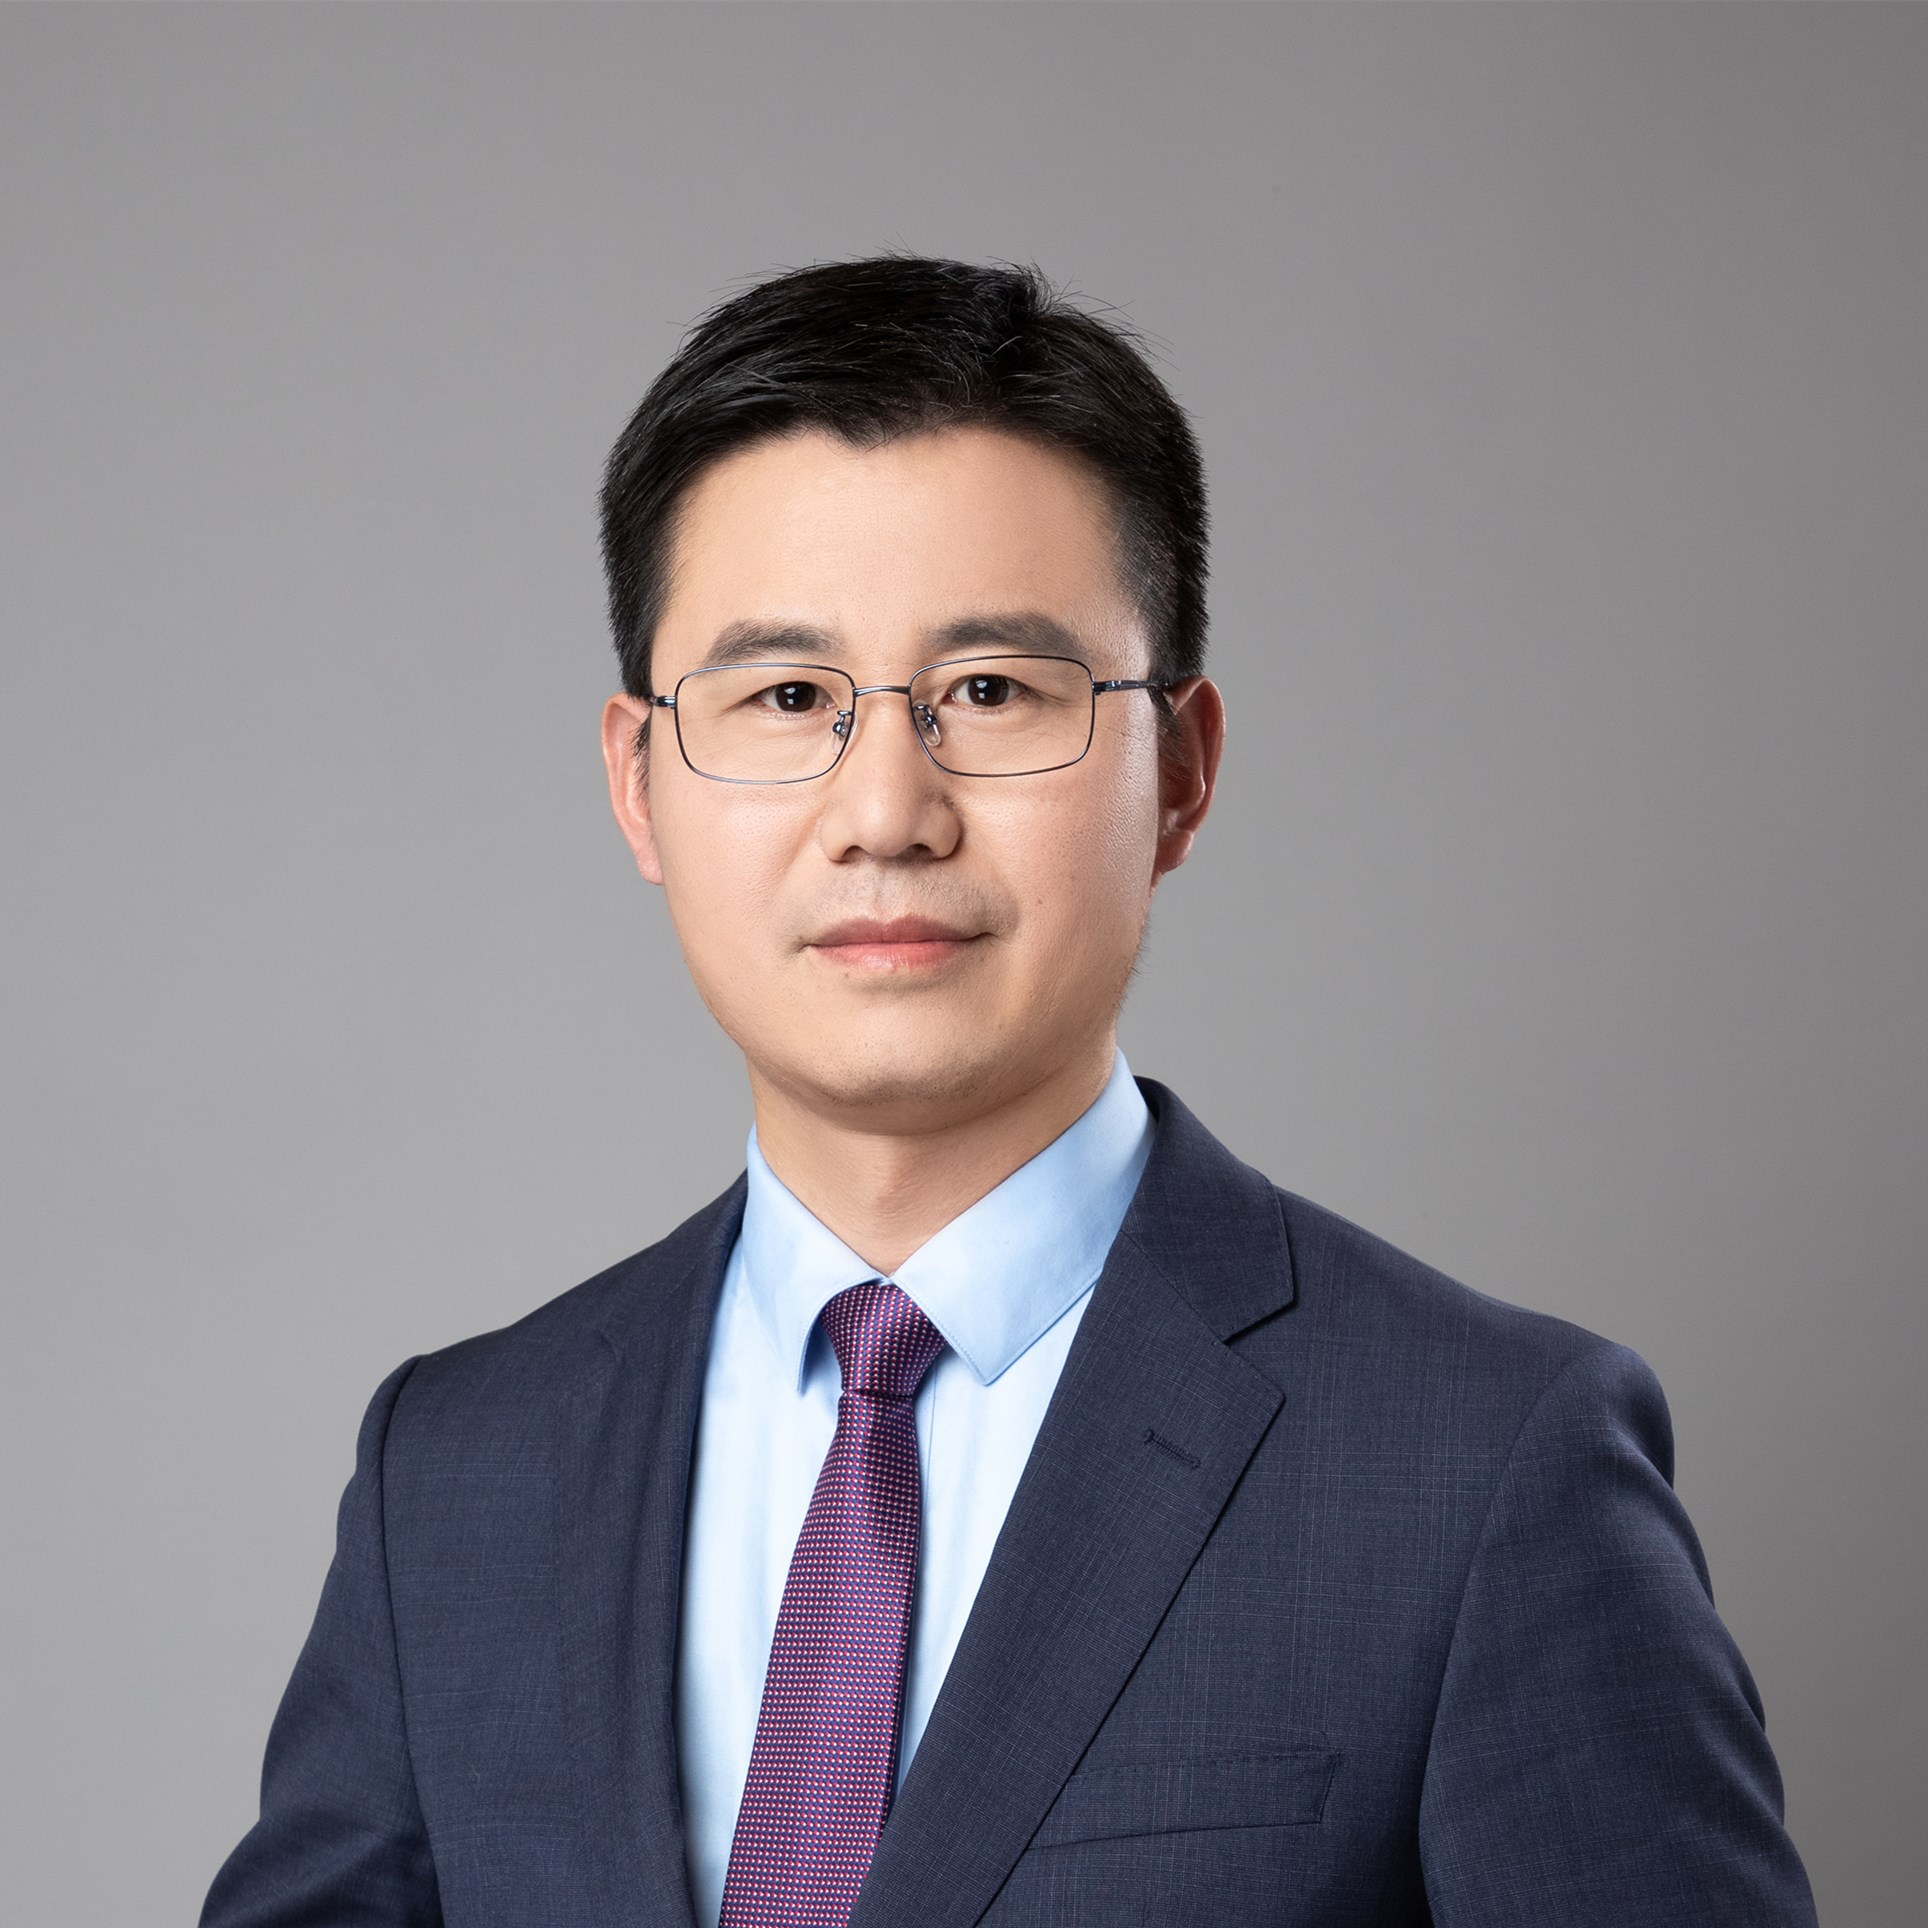 李新立律师